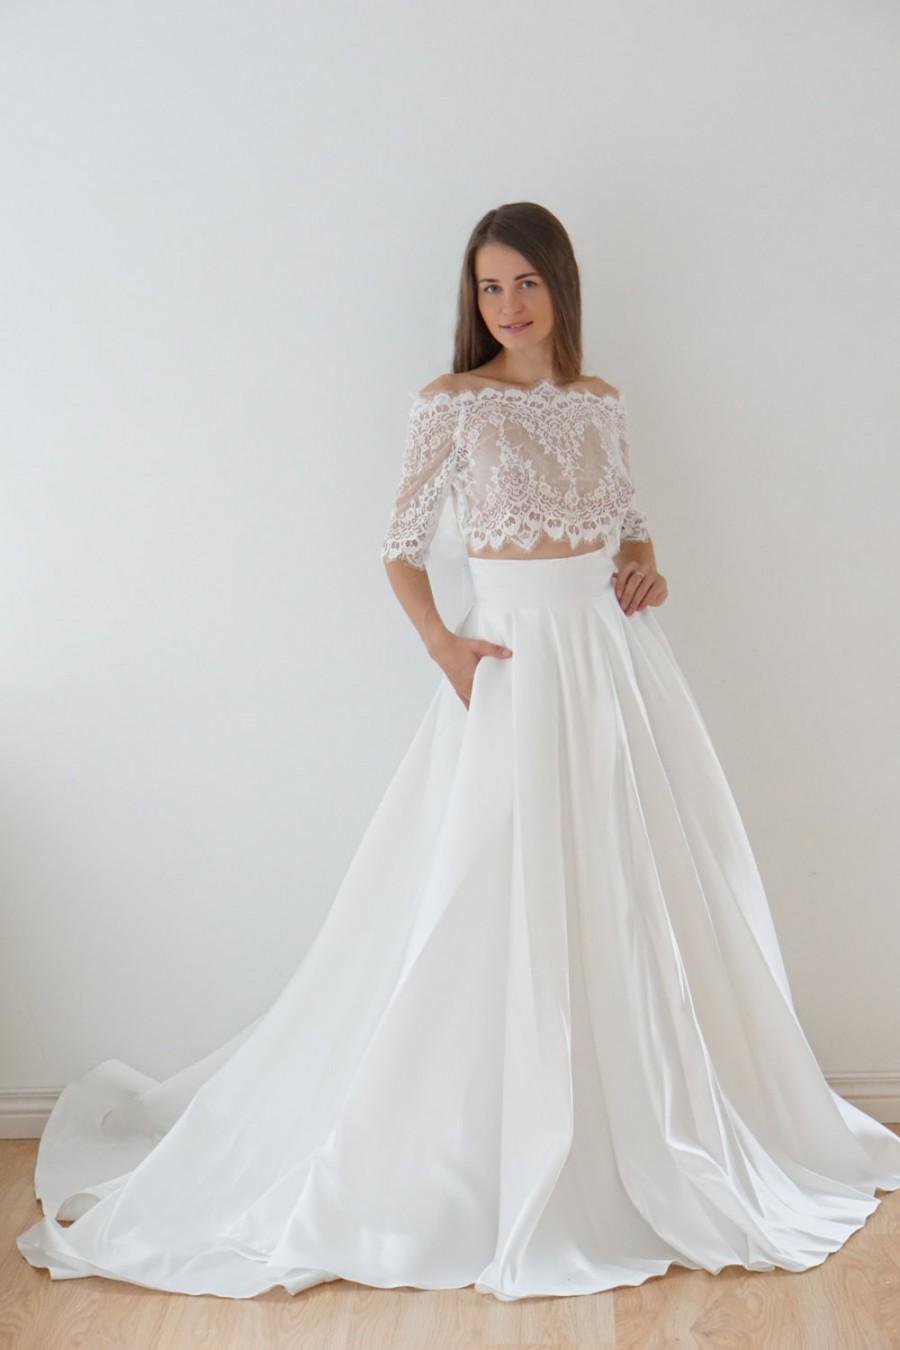 Crop Top Wedding Dress Satin Lace Bolero With Pocket Tail